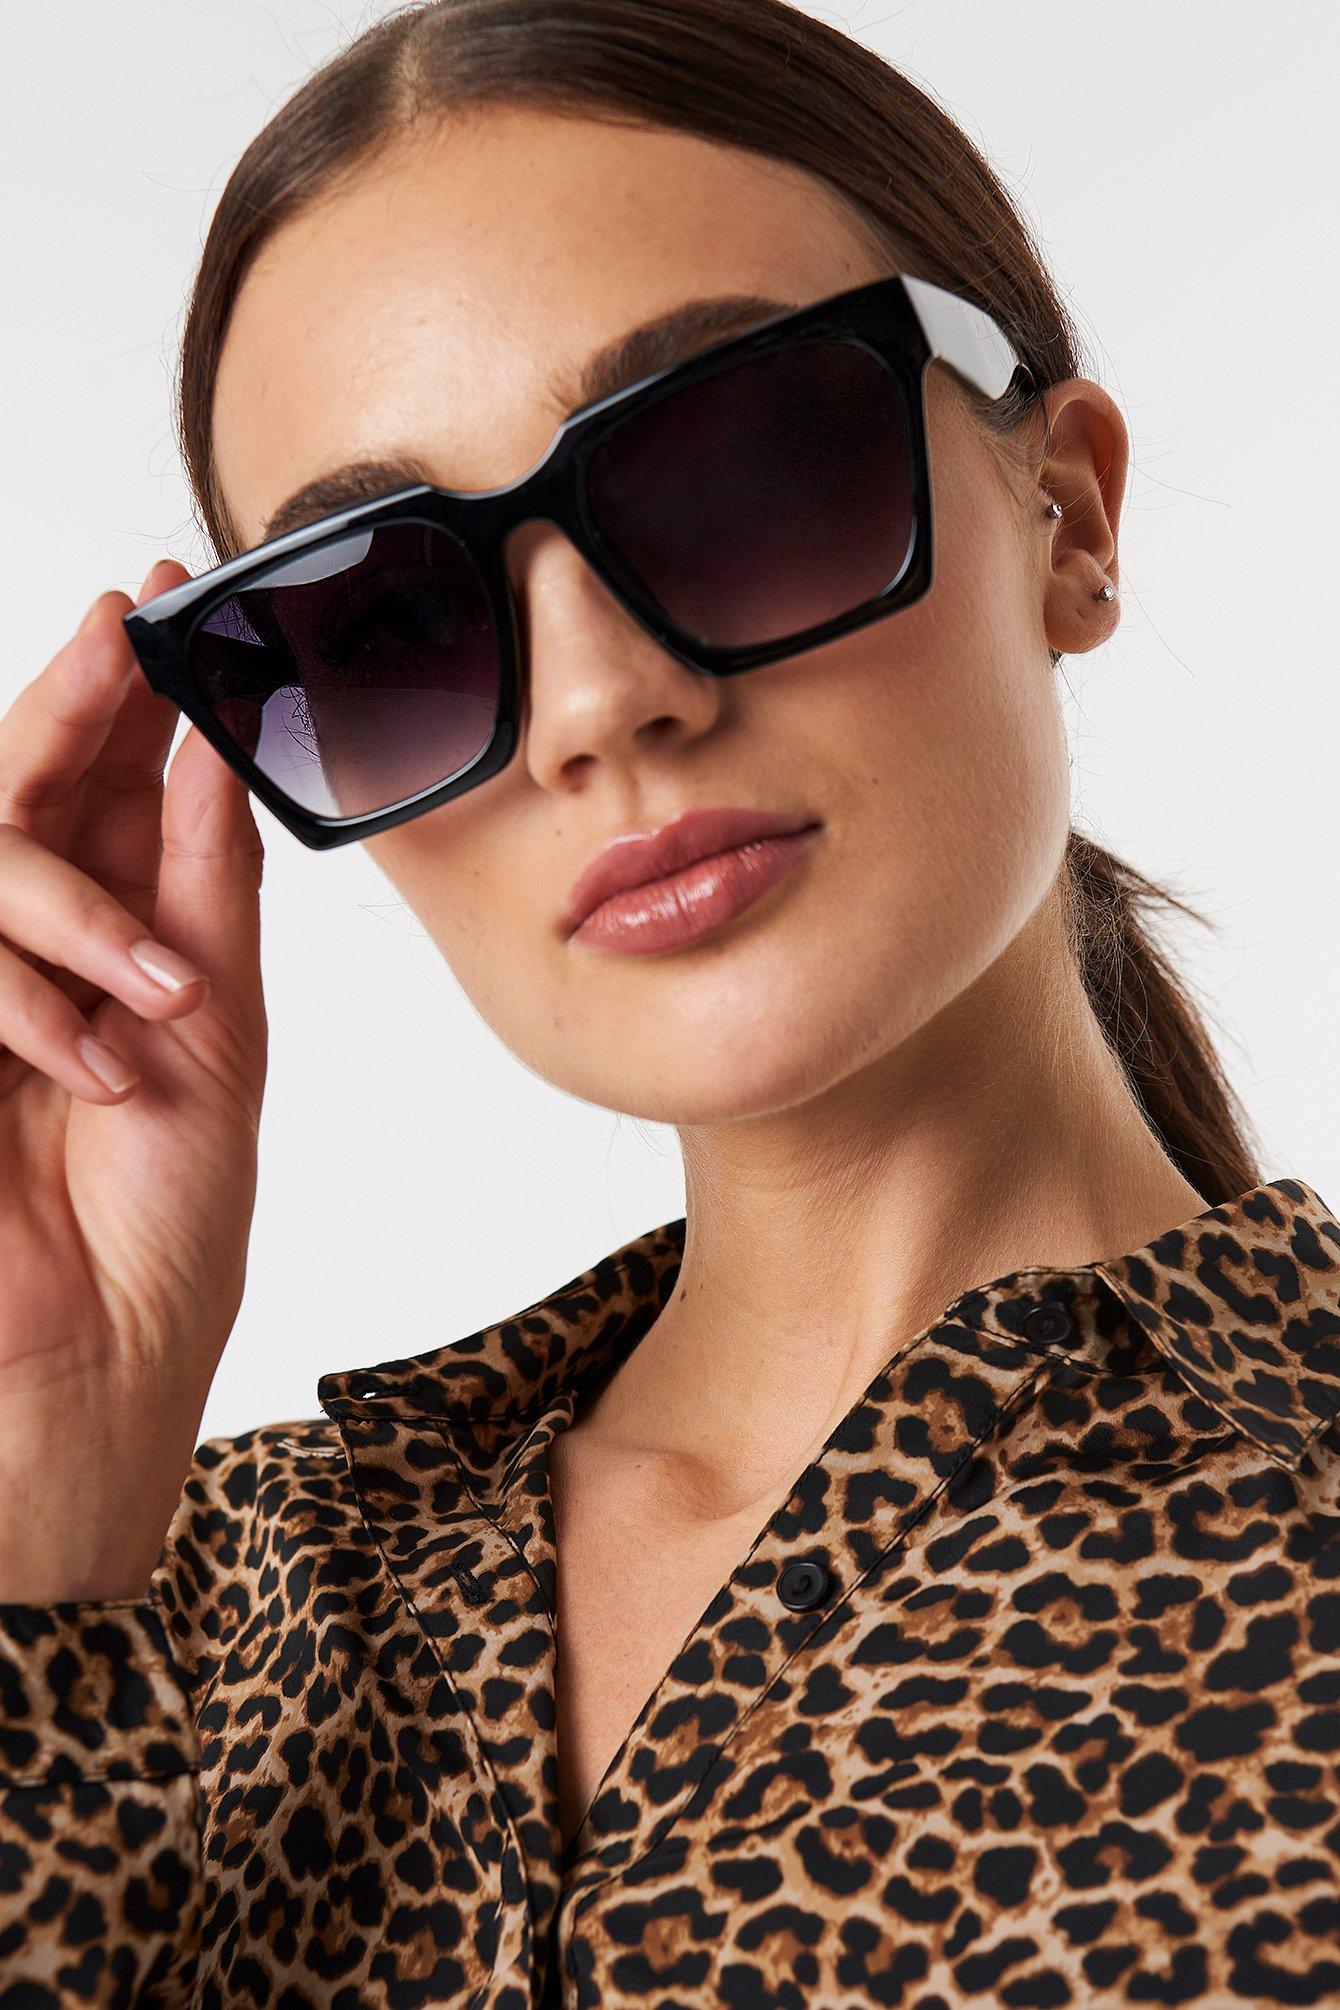 na-kd accessories -  Oversize Squared Sunglasses - Black